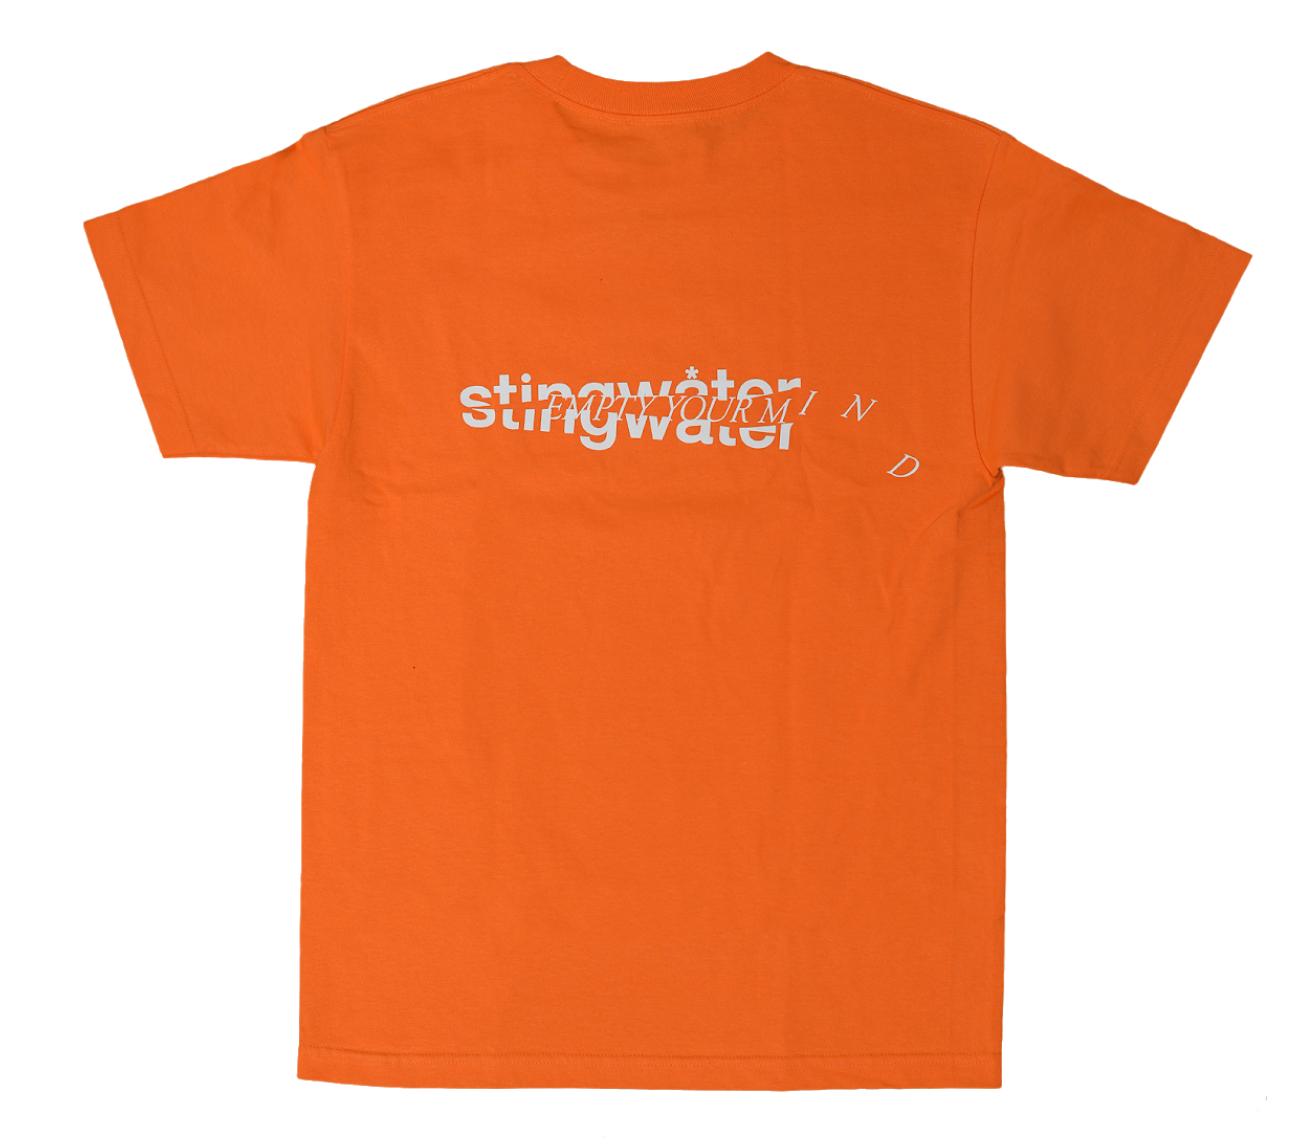 Stingwater New Skin Orange Tee